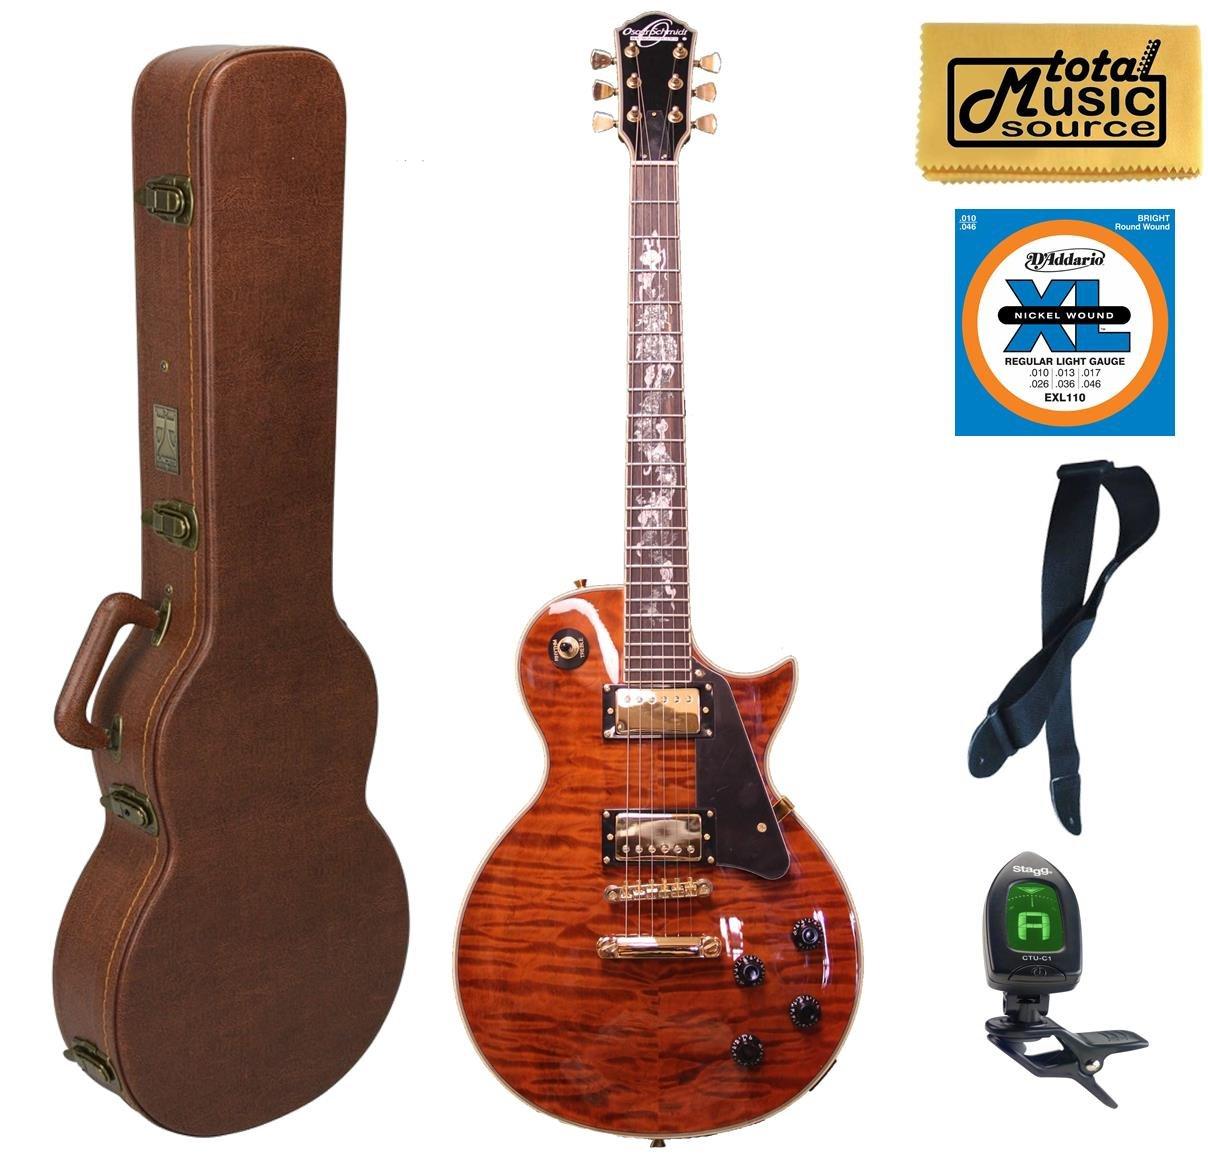 Oscar Schmidt OE20 Electric Guitar, Serpentine Quilted Cali Case Bundle